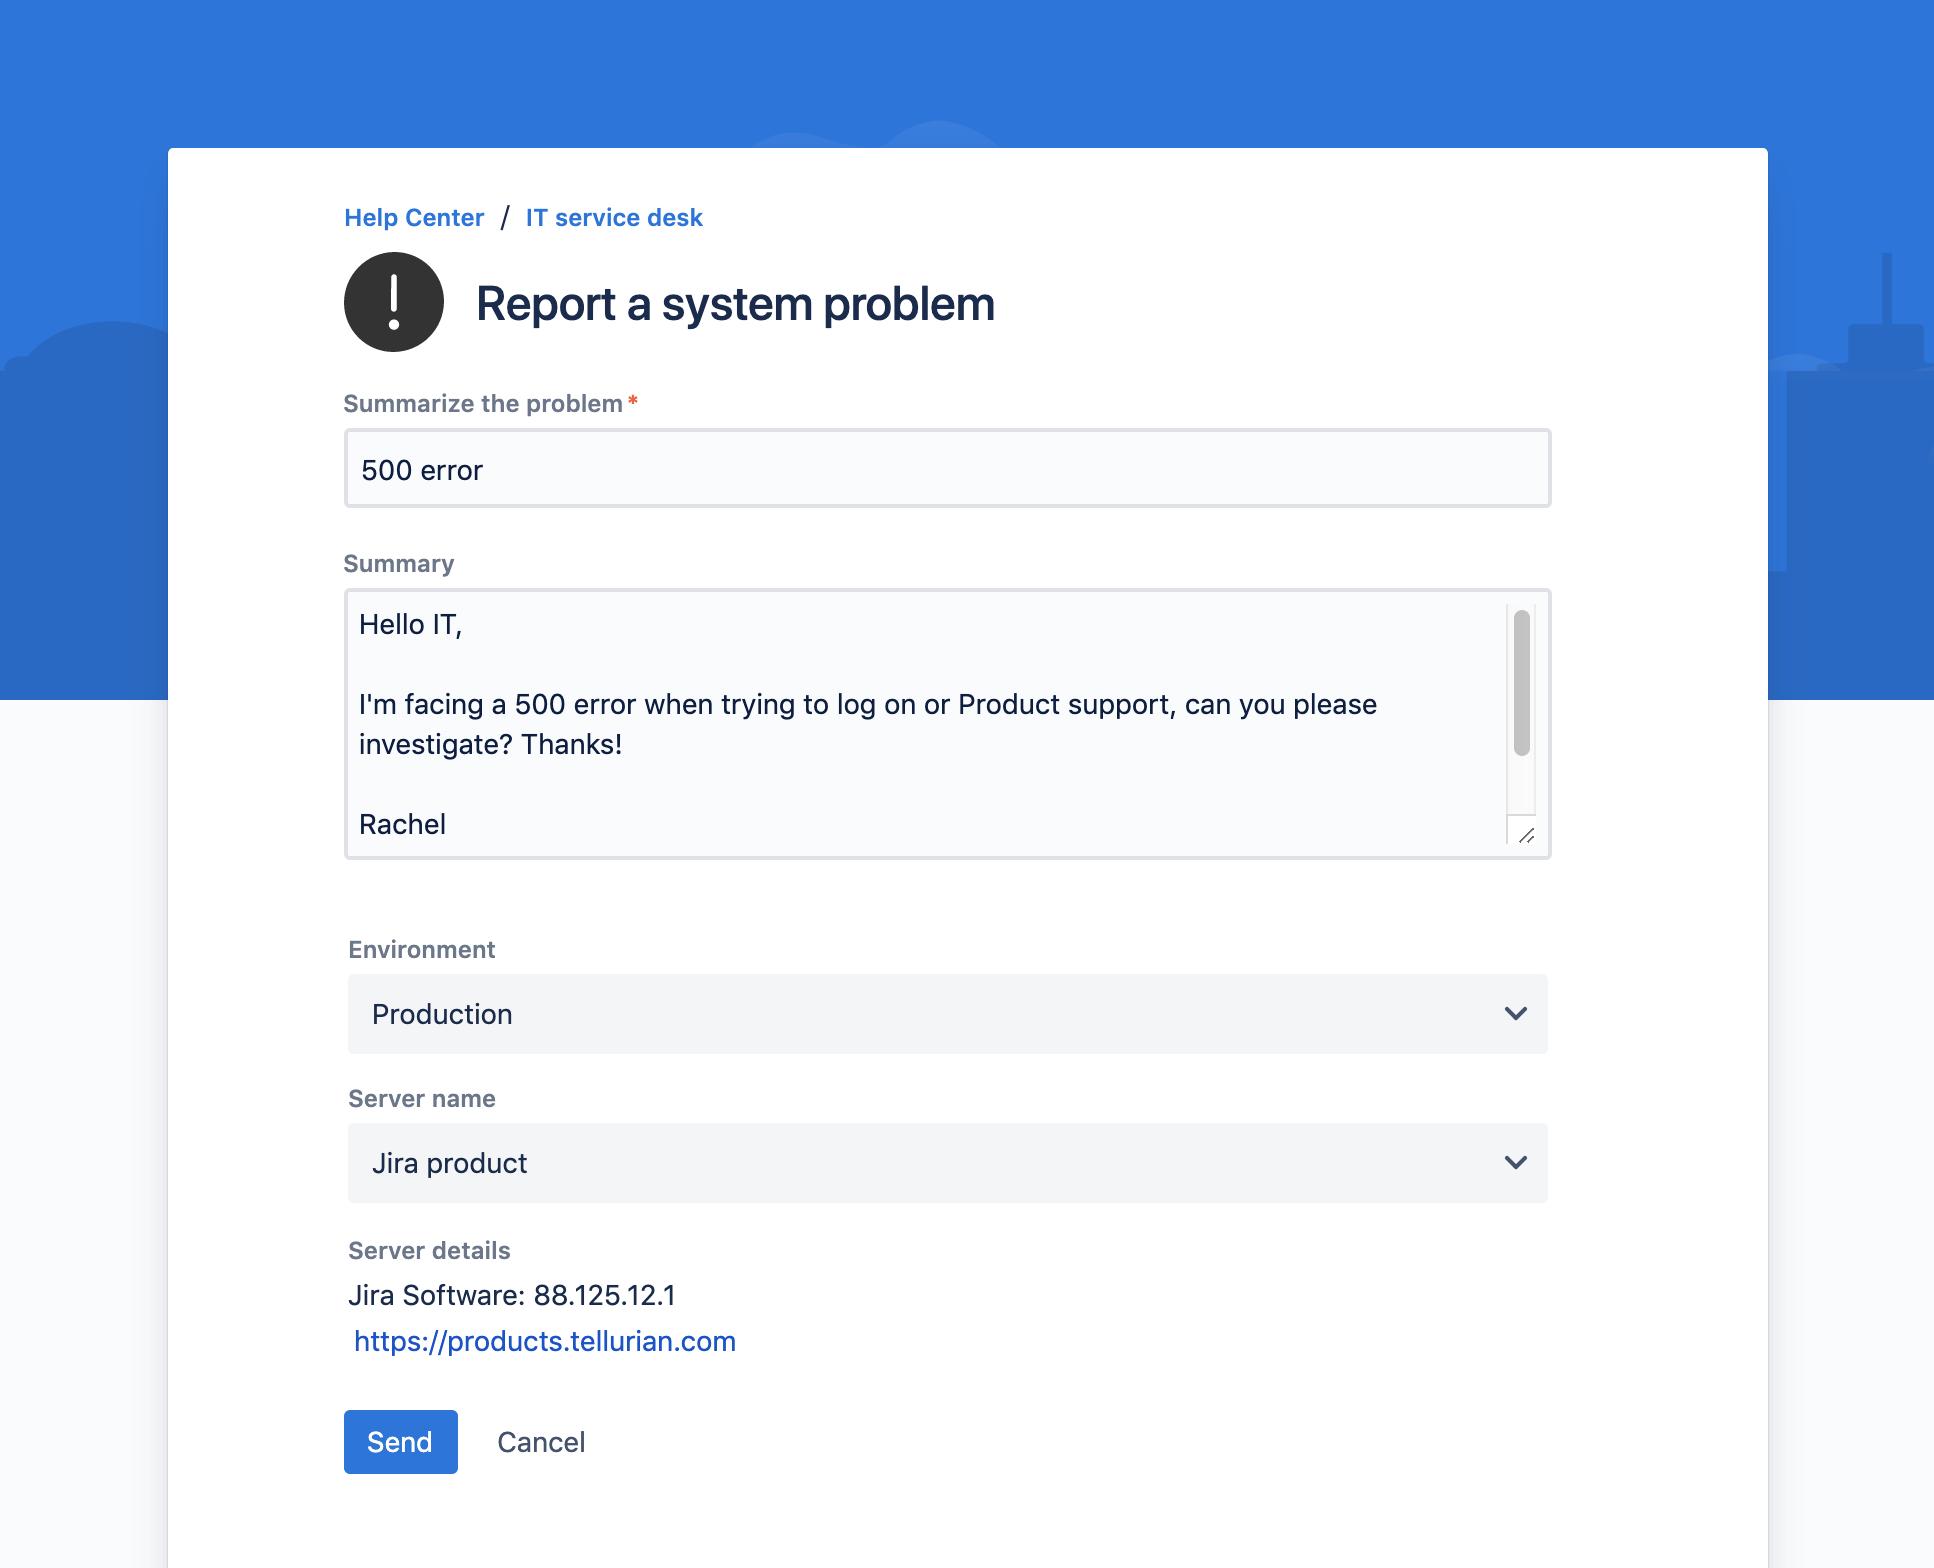 Así se ve un formulario de Jira Service Desk con Elements Connect for Jira Cloud